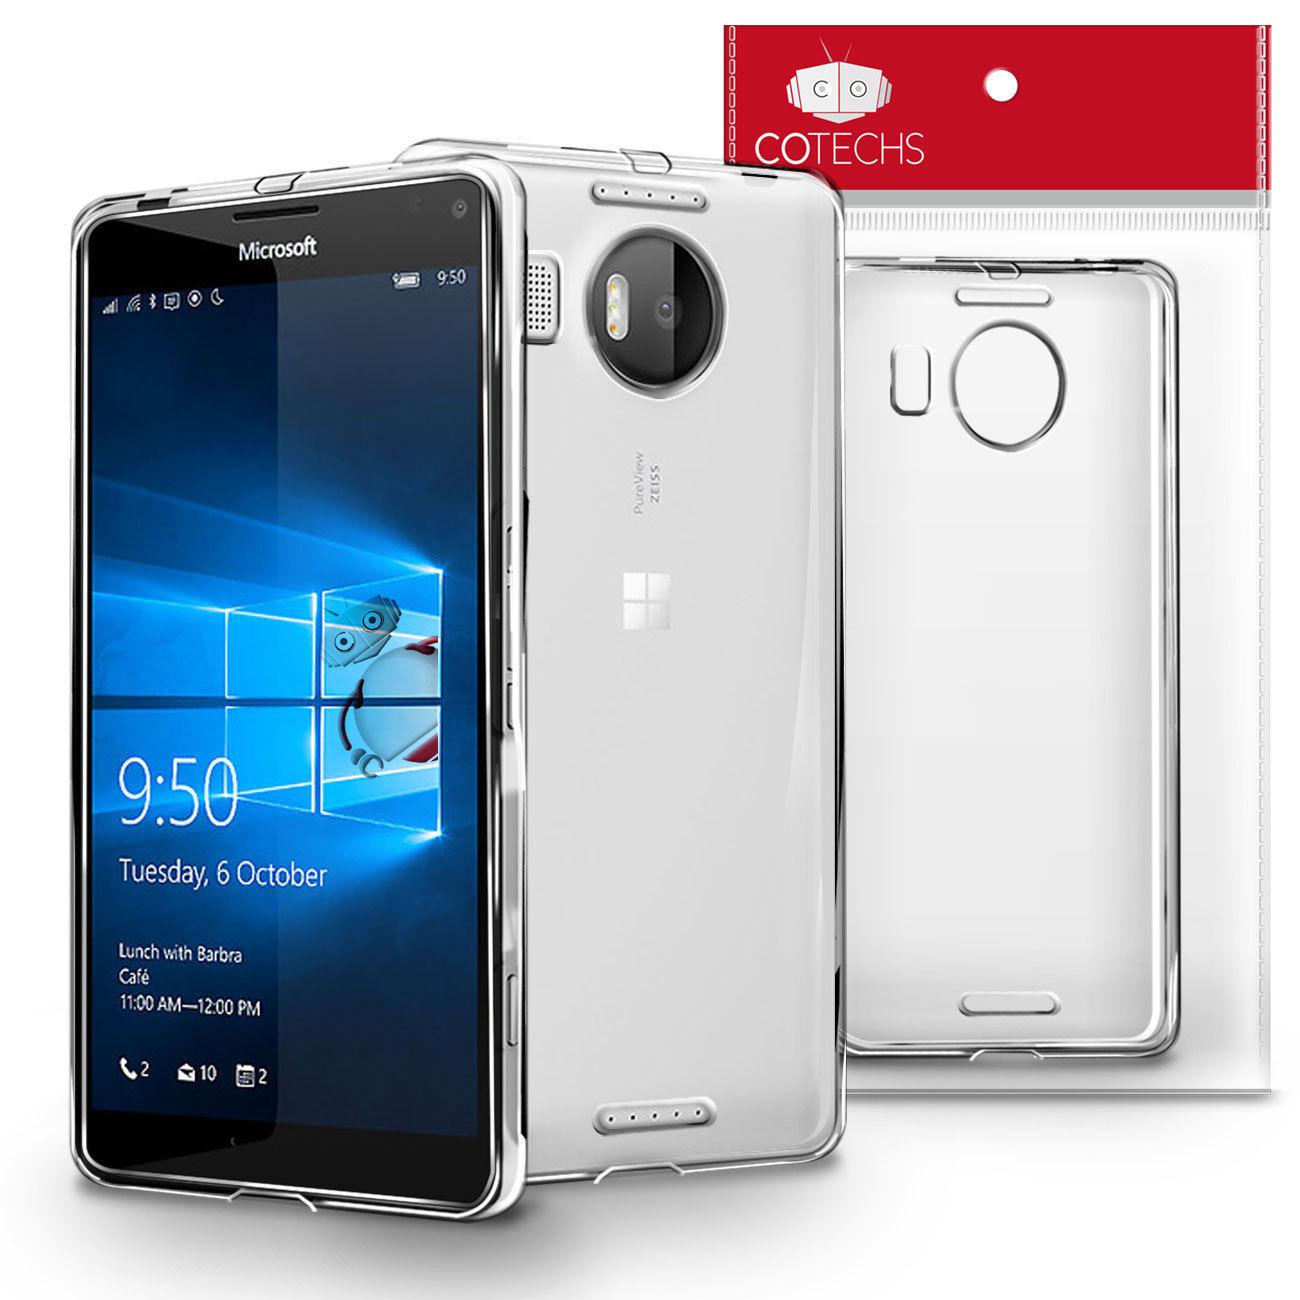 Pouzdro pro Microsoft Lumia 950 XL průhledné